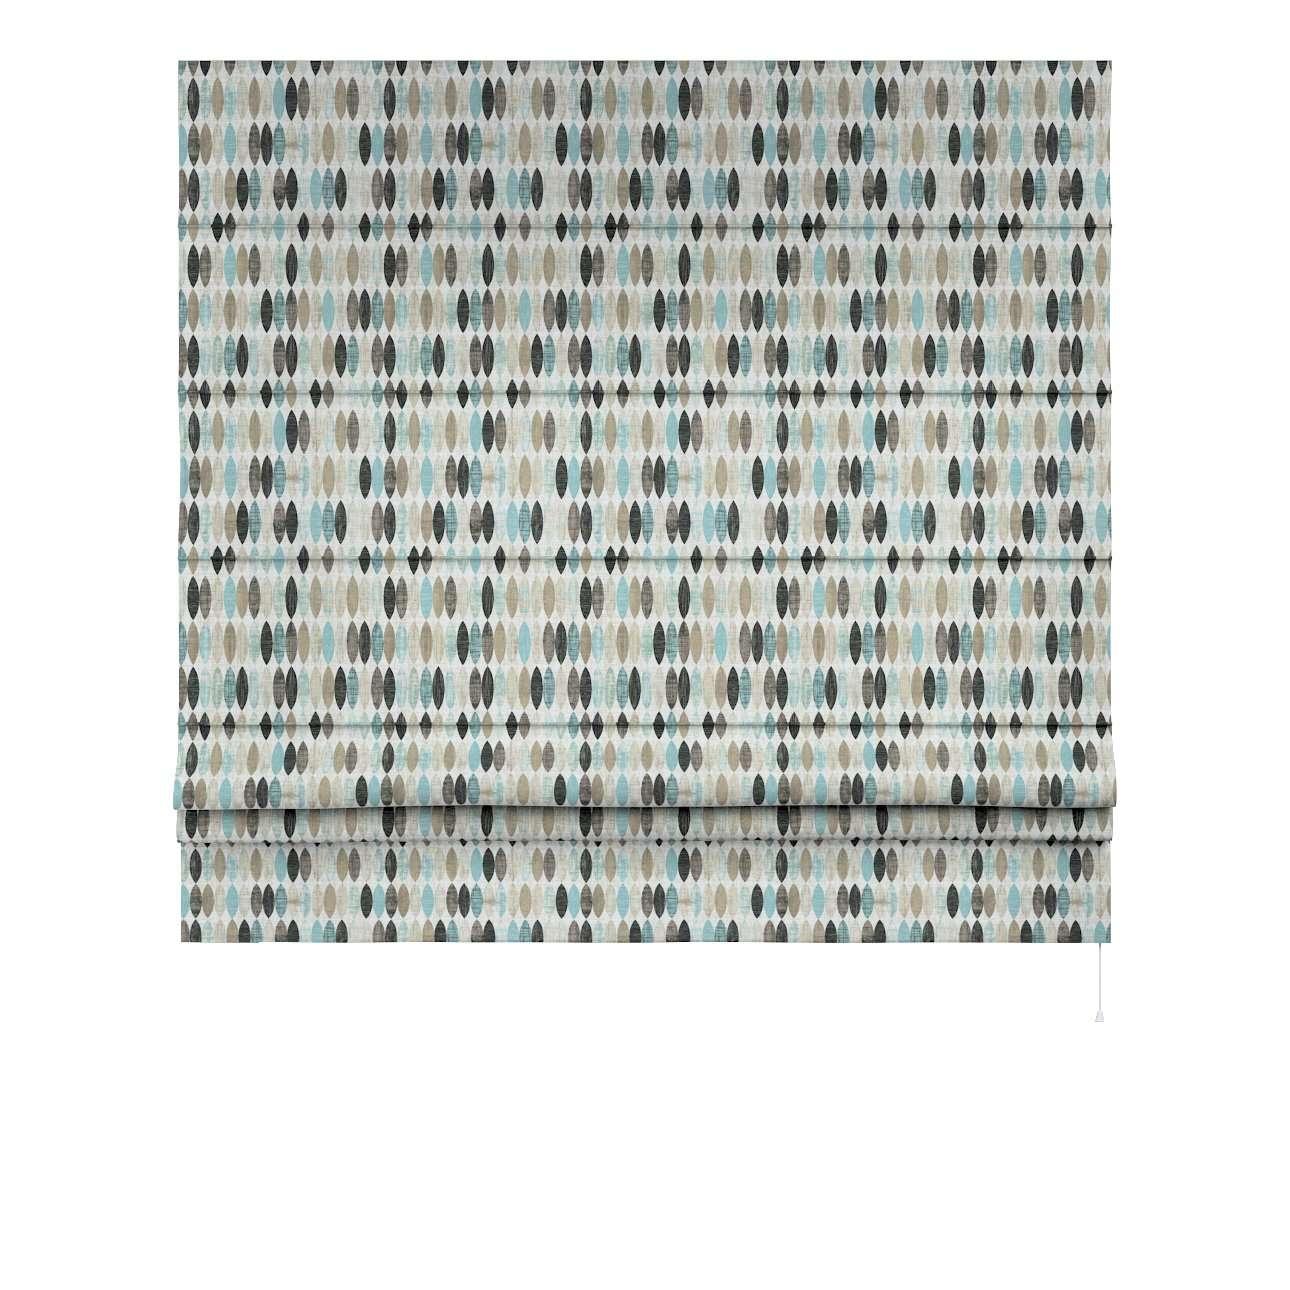 Rímska roleta Padva V kolekcii Modern, tkanina: 141-91